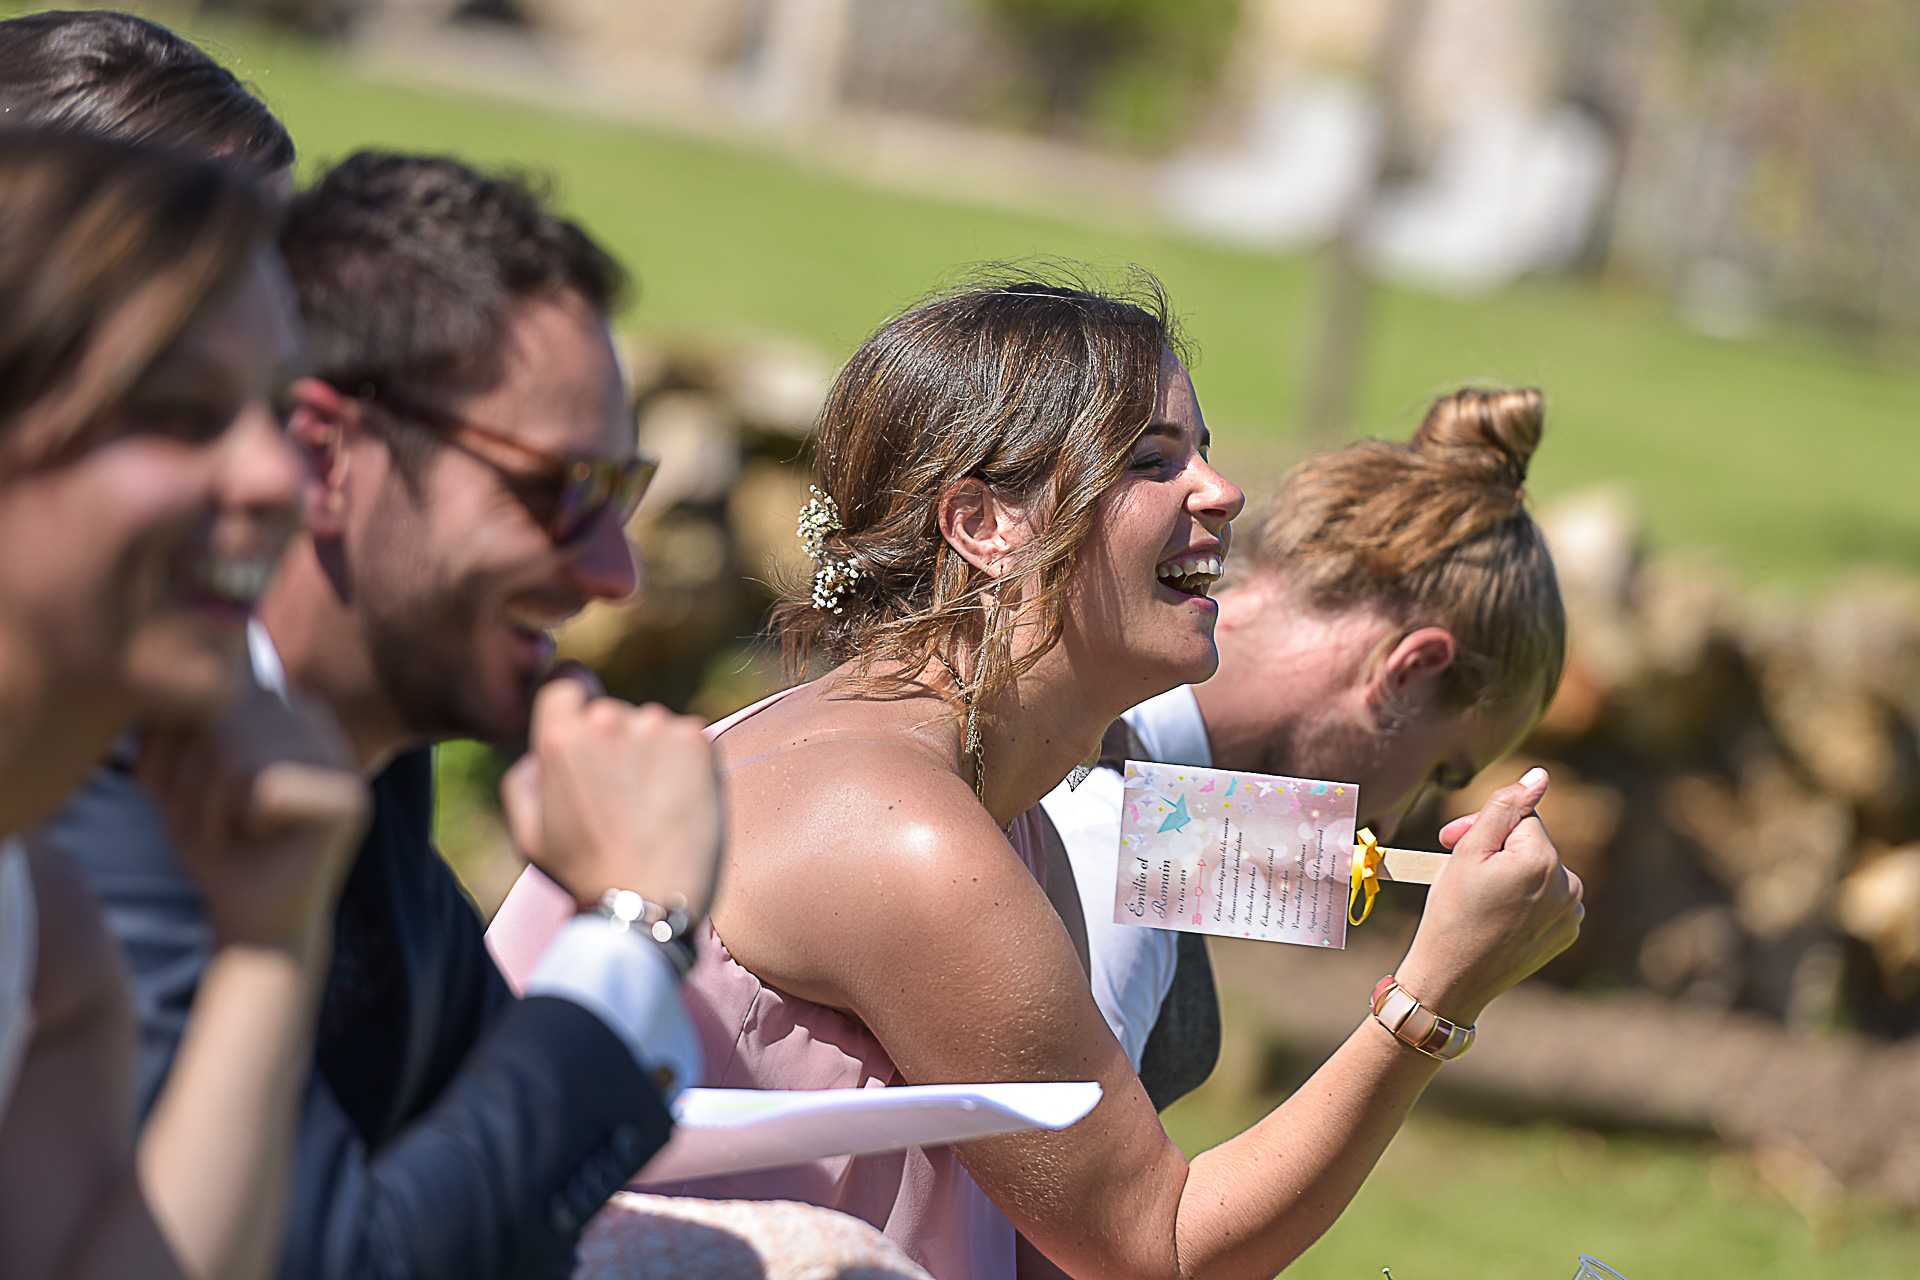 photographe-mariage-ceremonie-laique-invites